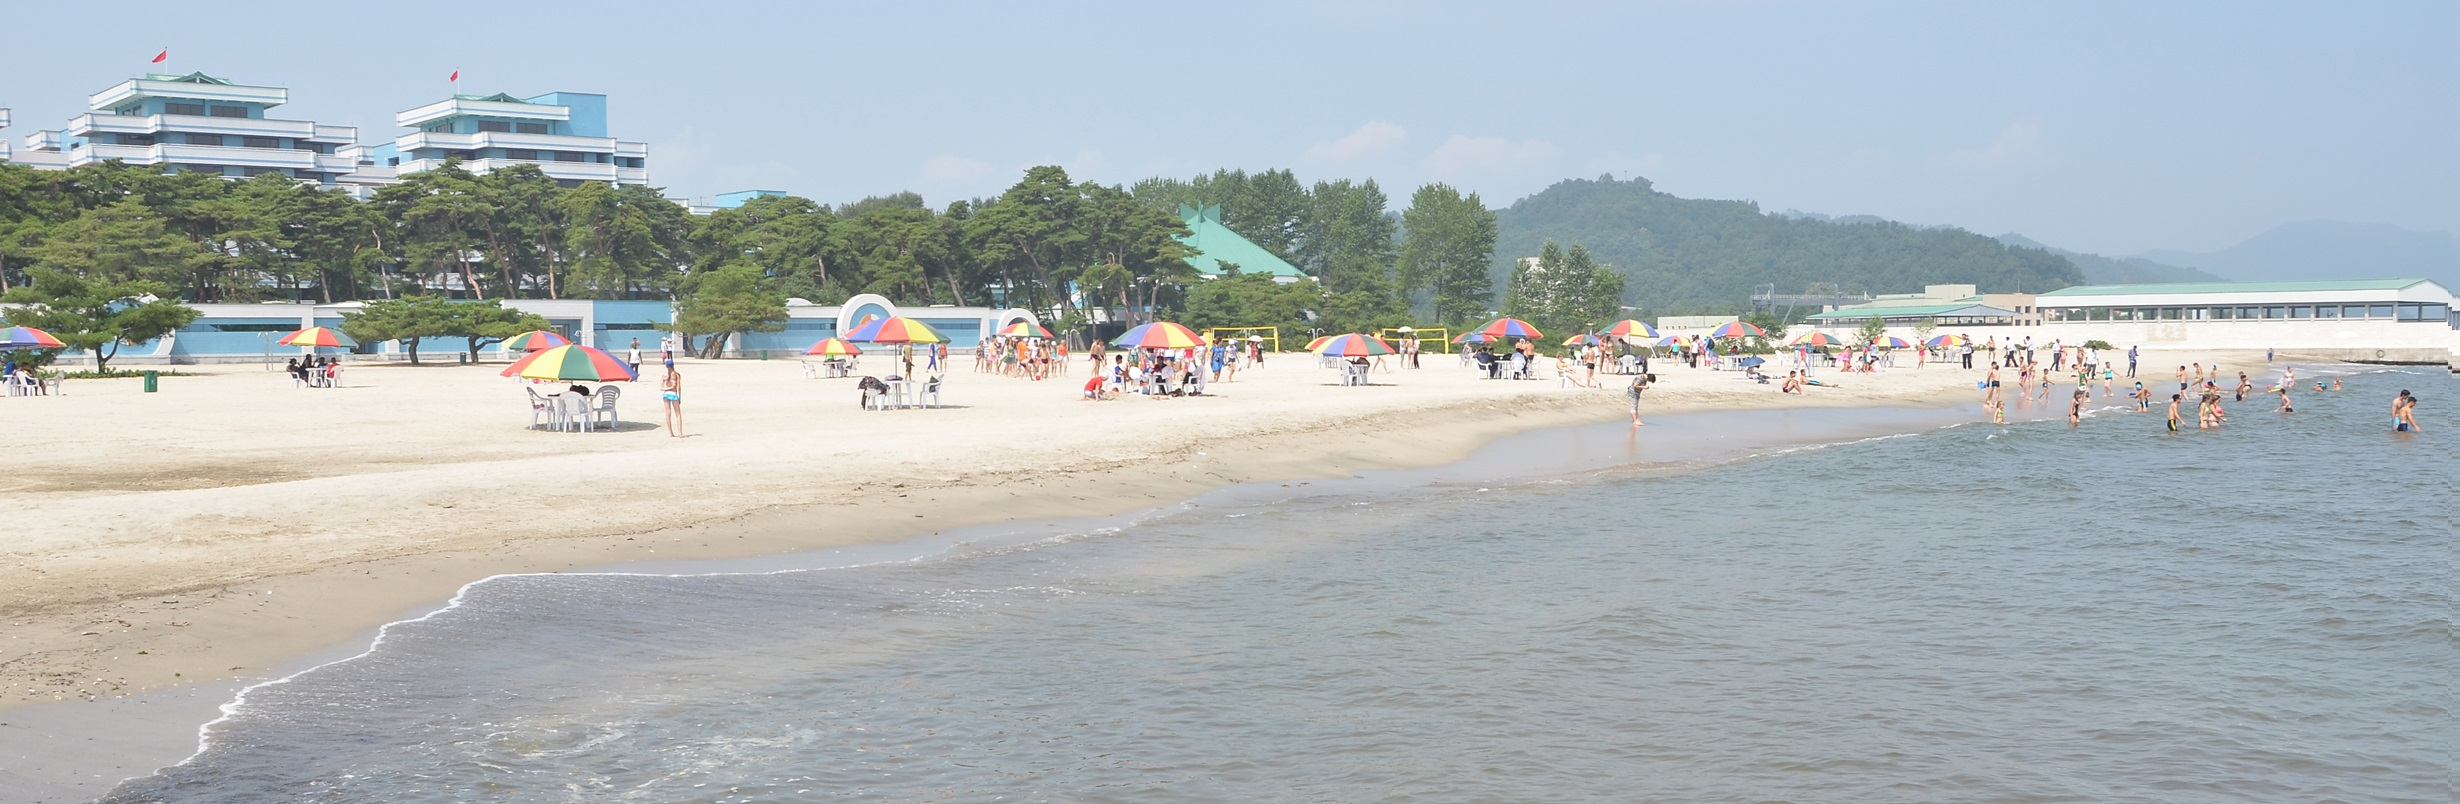 Songdowon Int'l Children's Camp beach